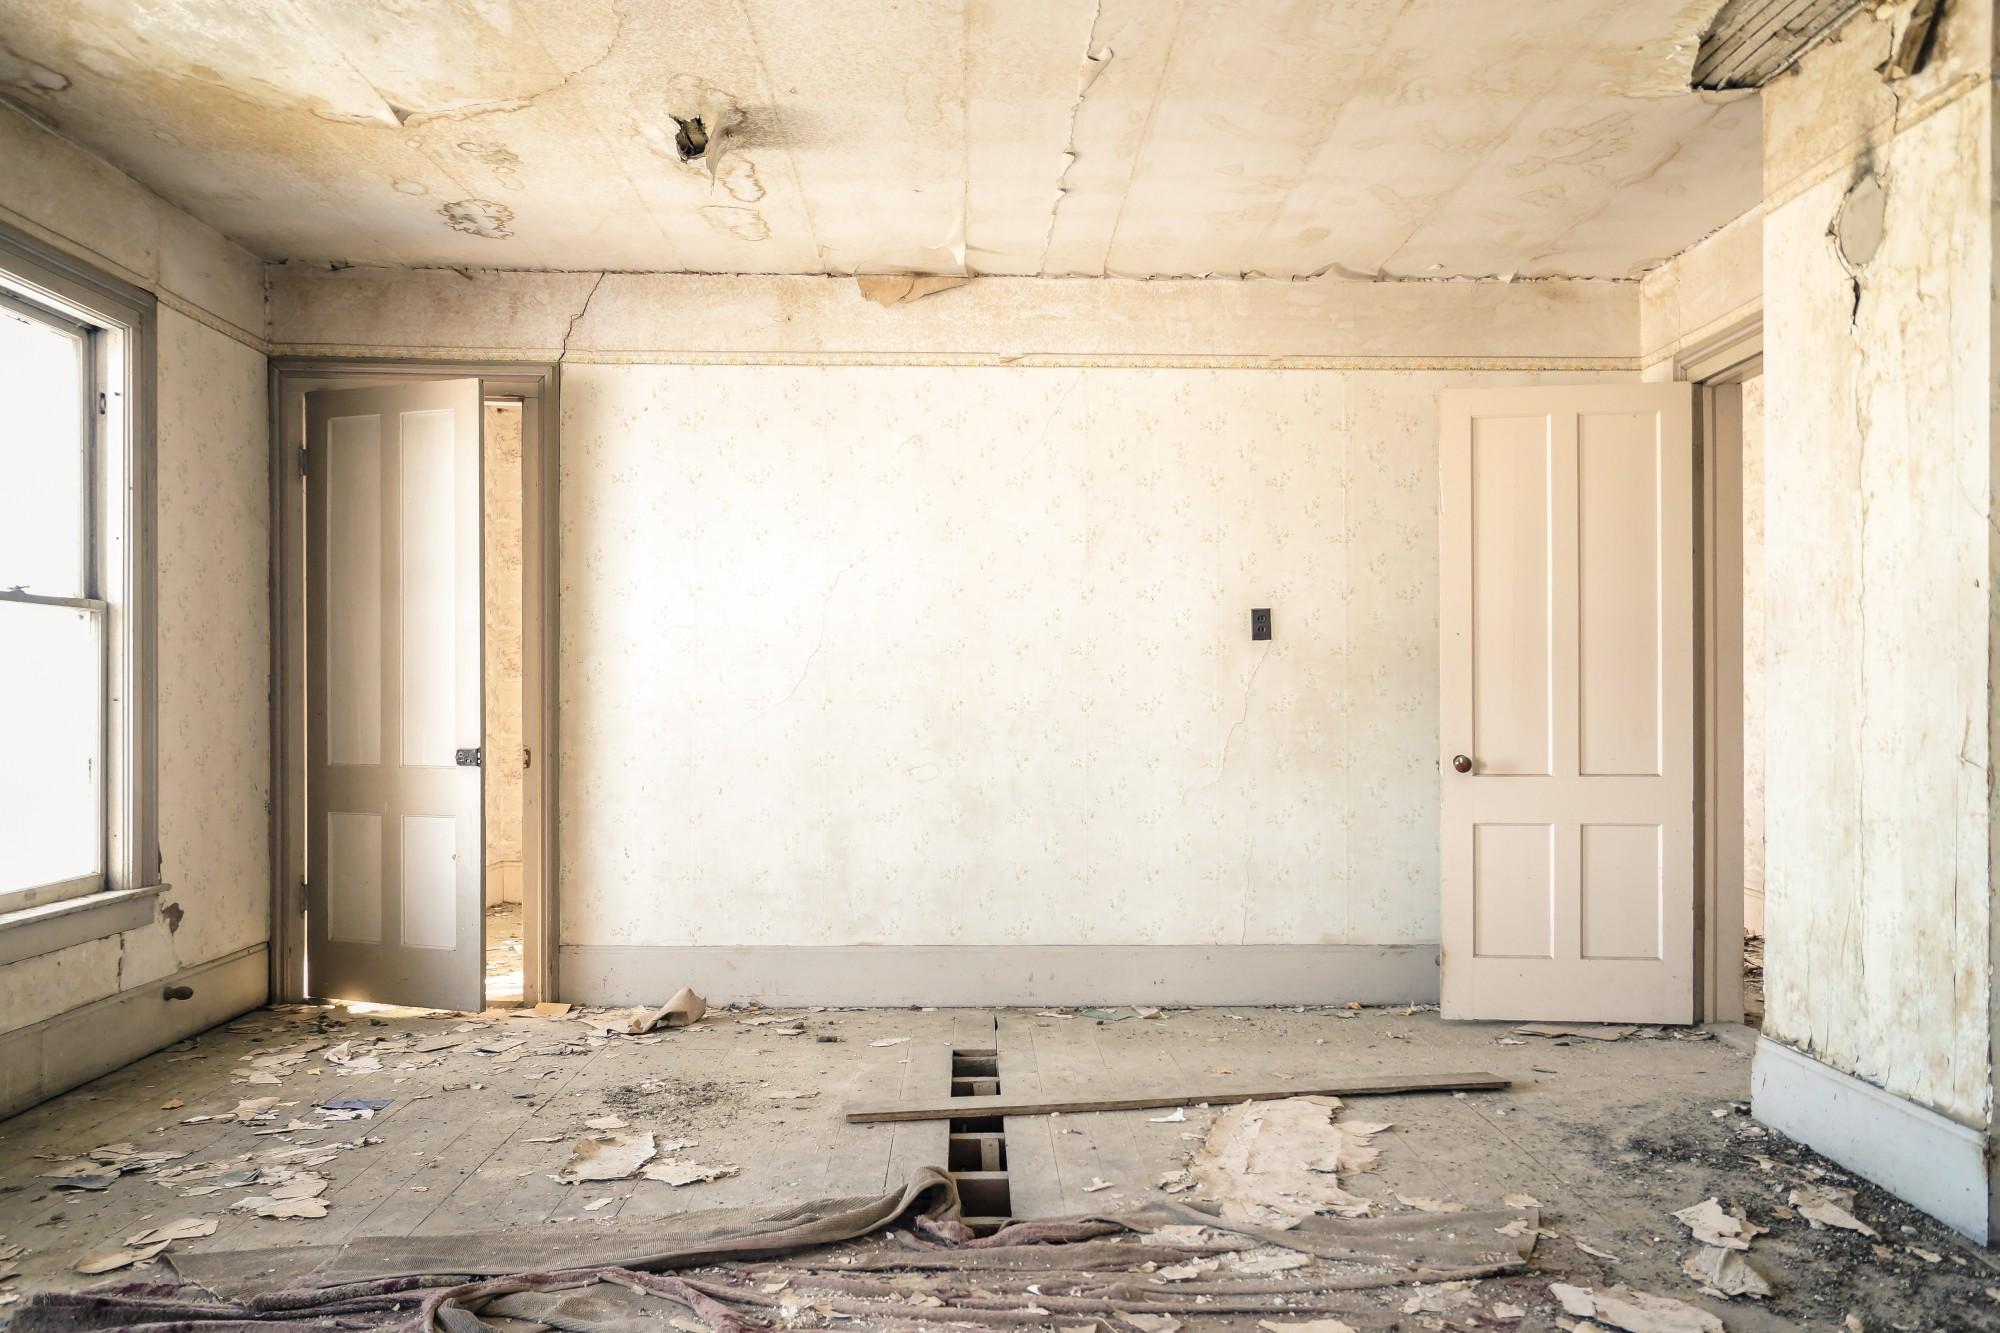 Convert Your Space: 5 Basement Renovation Ideas